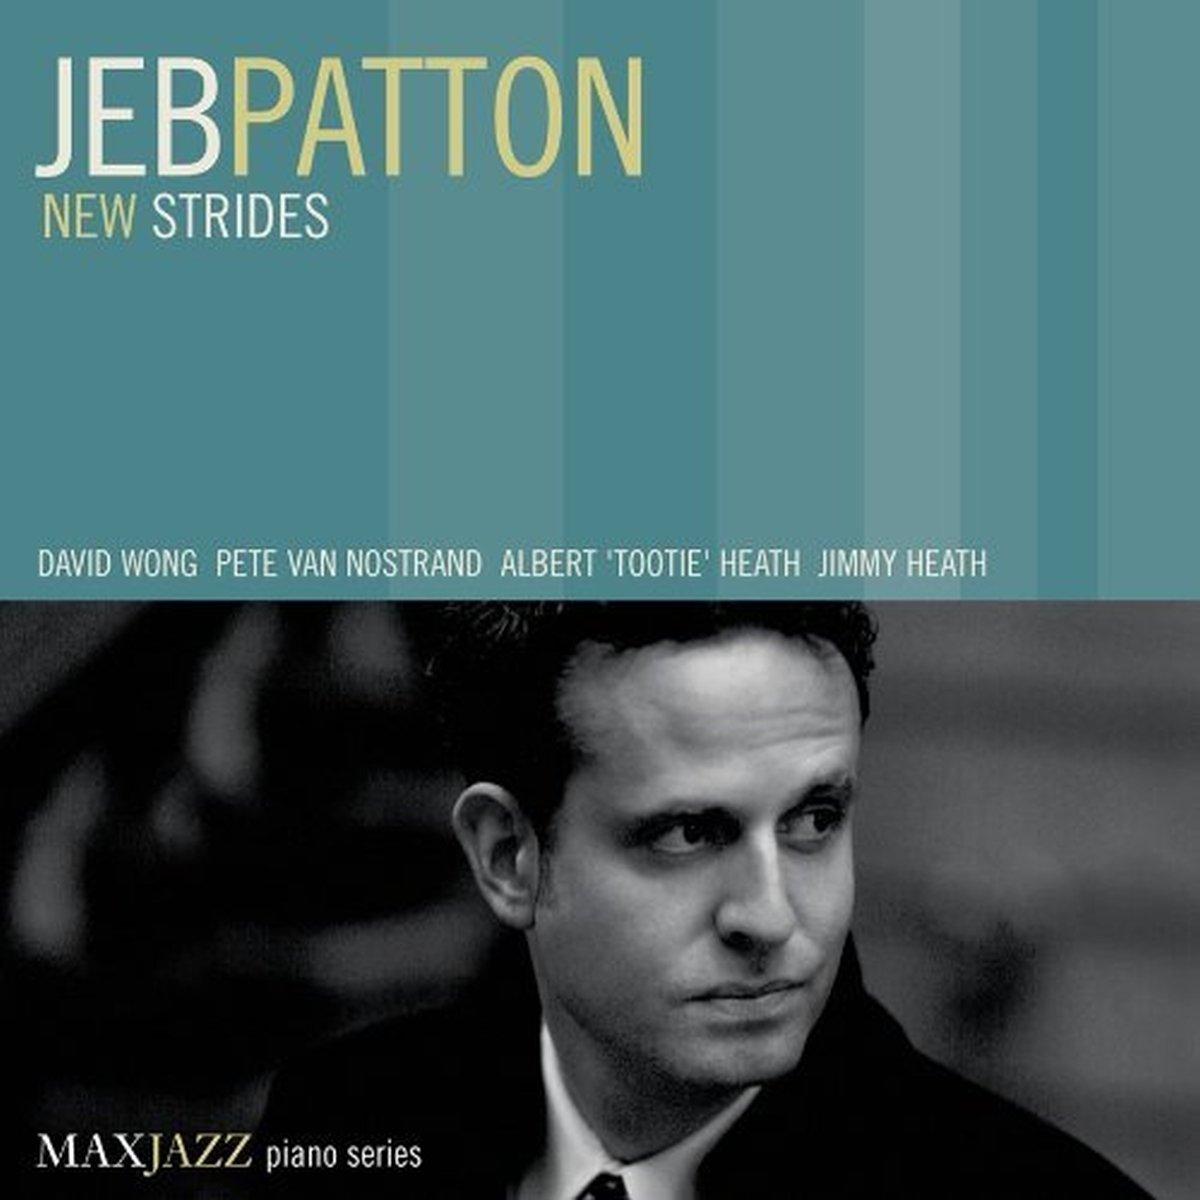 Jeb Patton - New Strides - Amazon.com Music